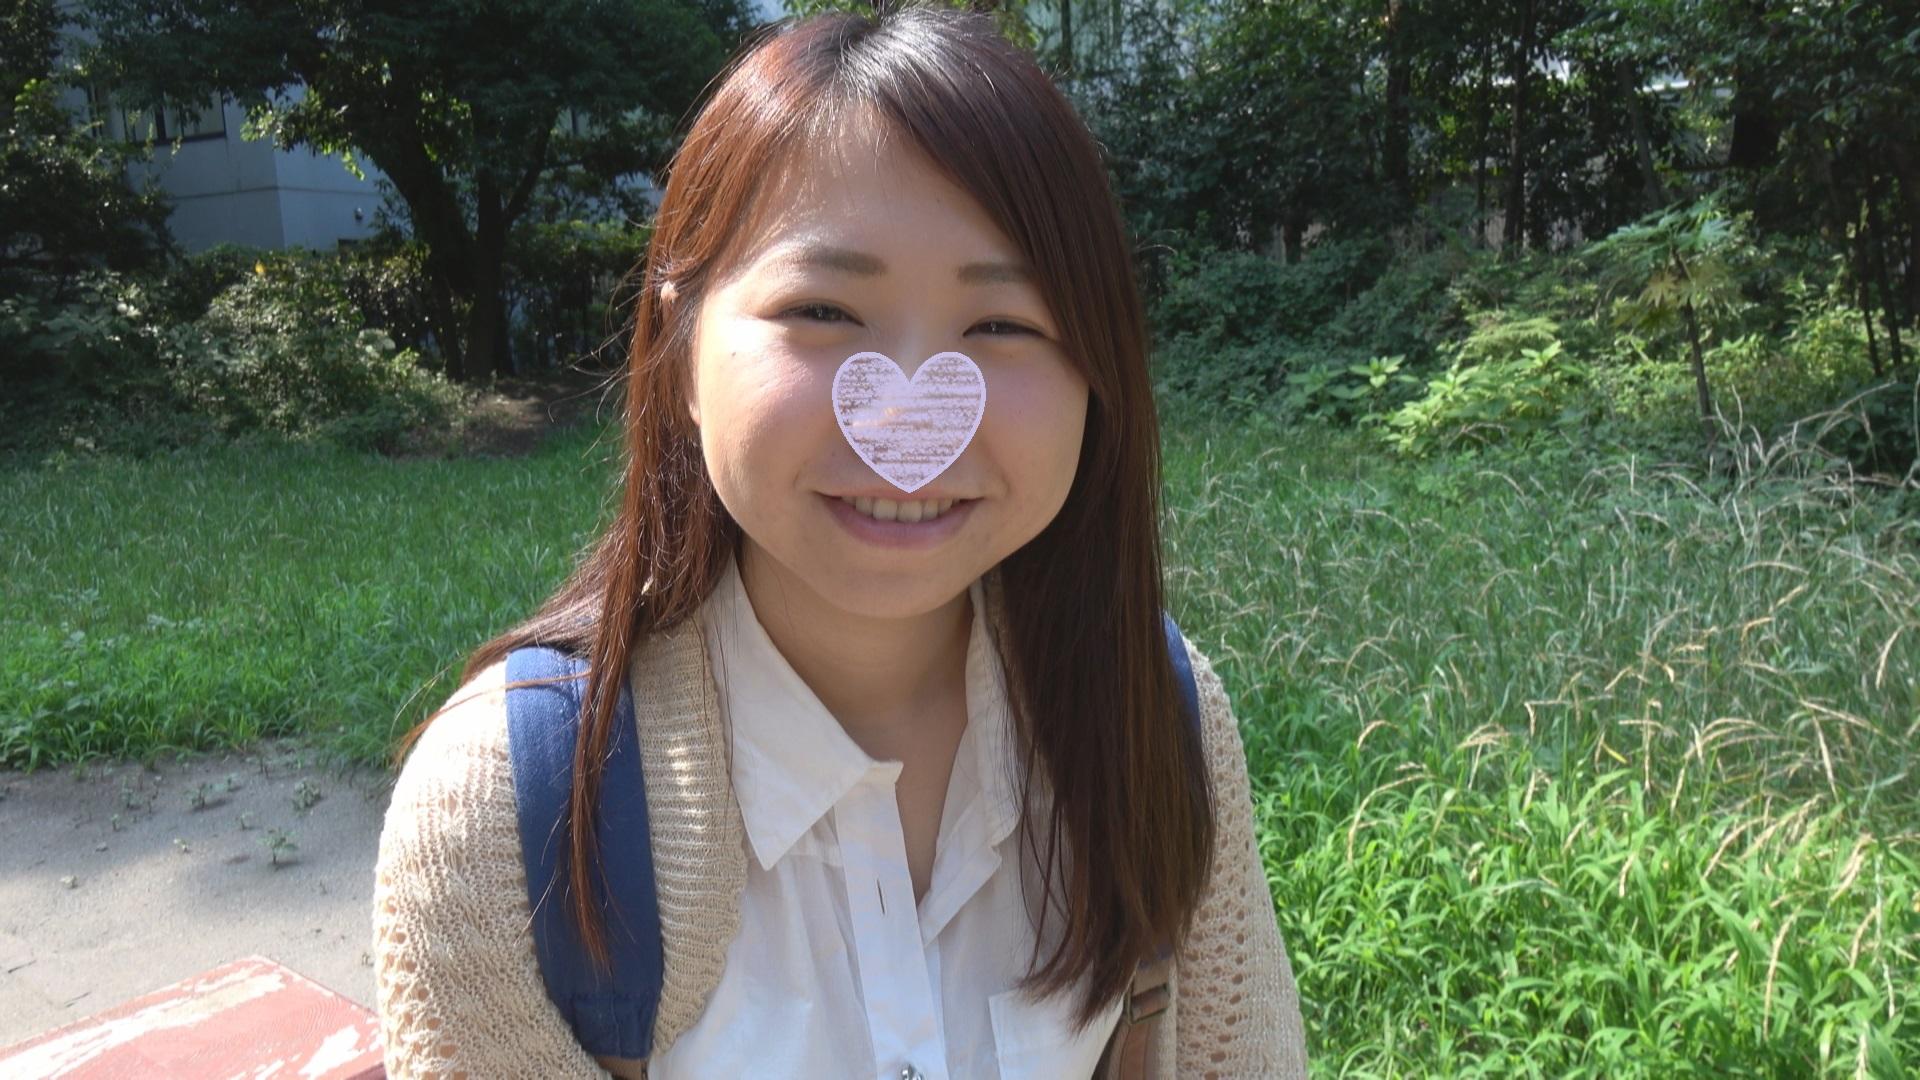 FC2 PPV 932319 【個人撮影】プニプニ童顔天使みのりちゃん前後編セット